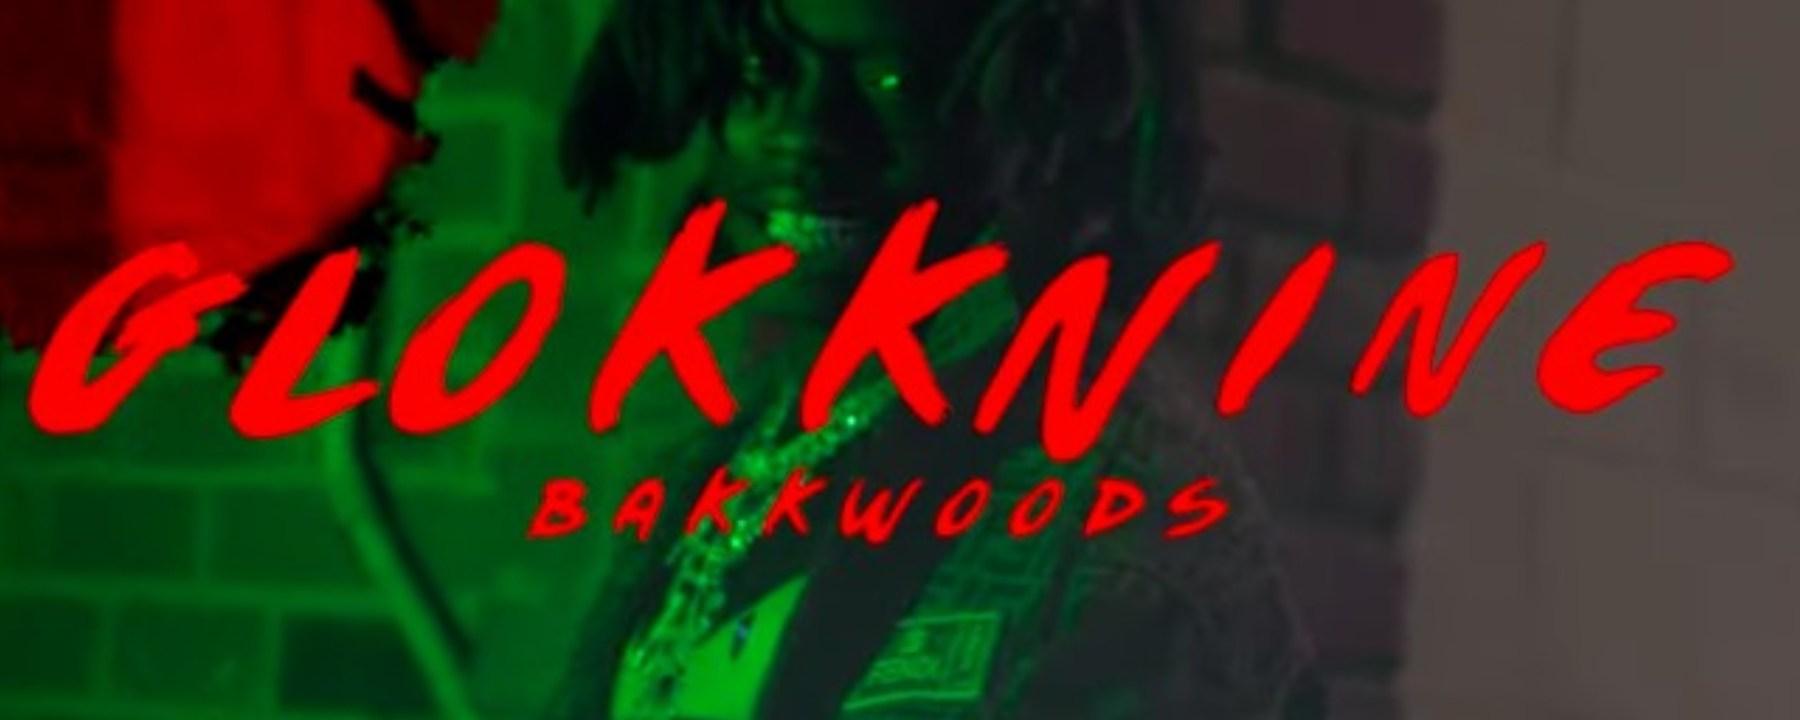 9lokknine bakkwoods